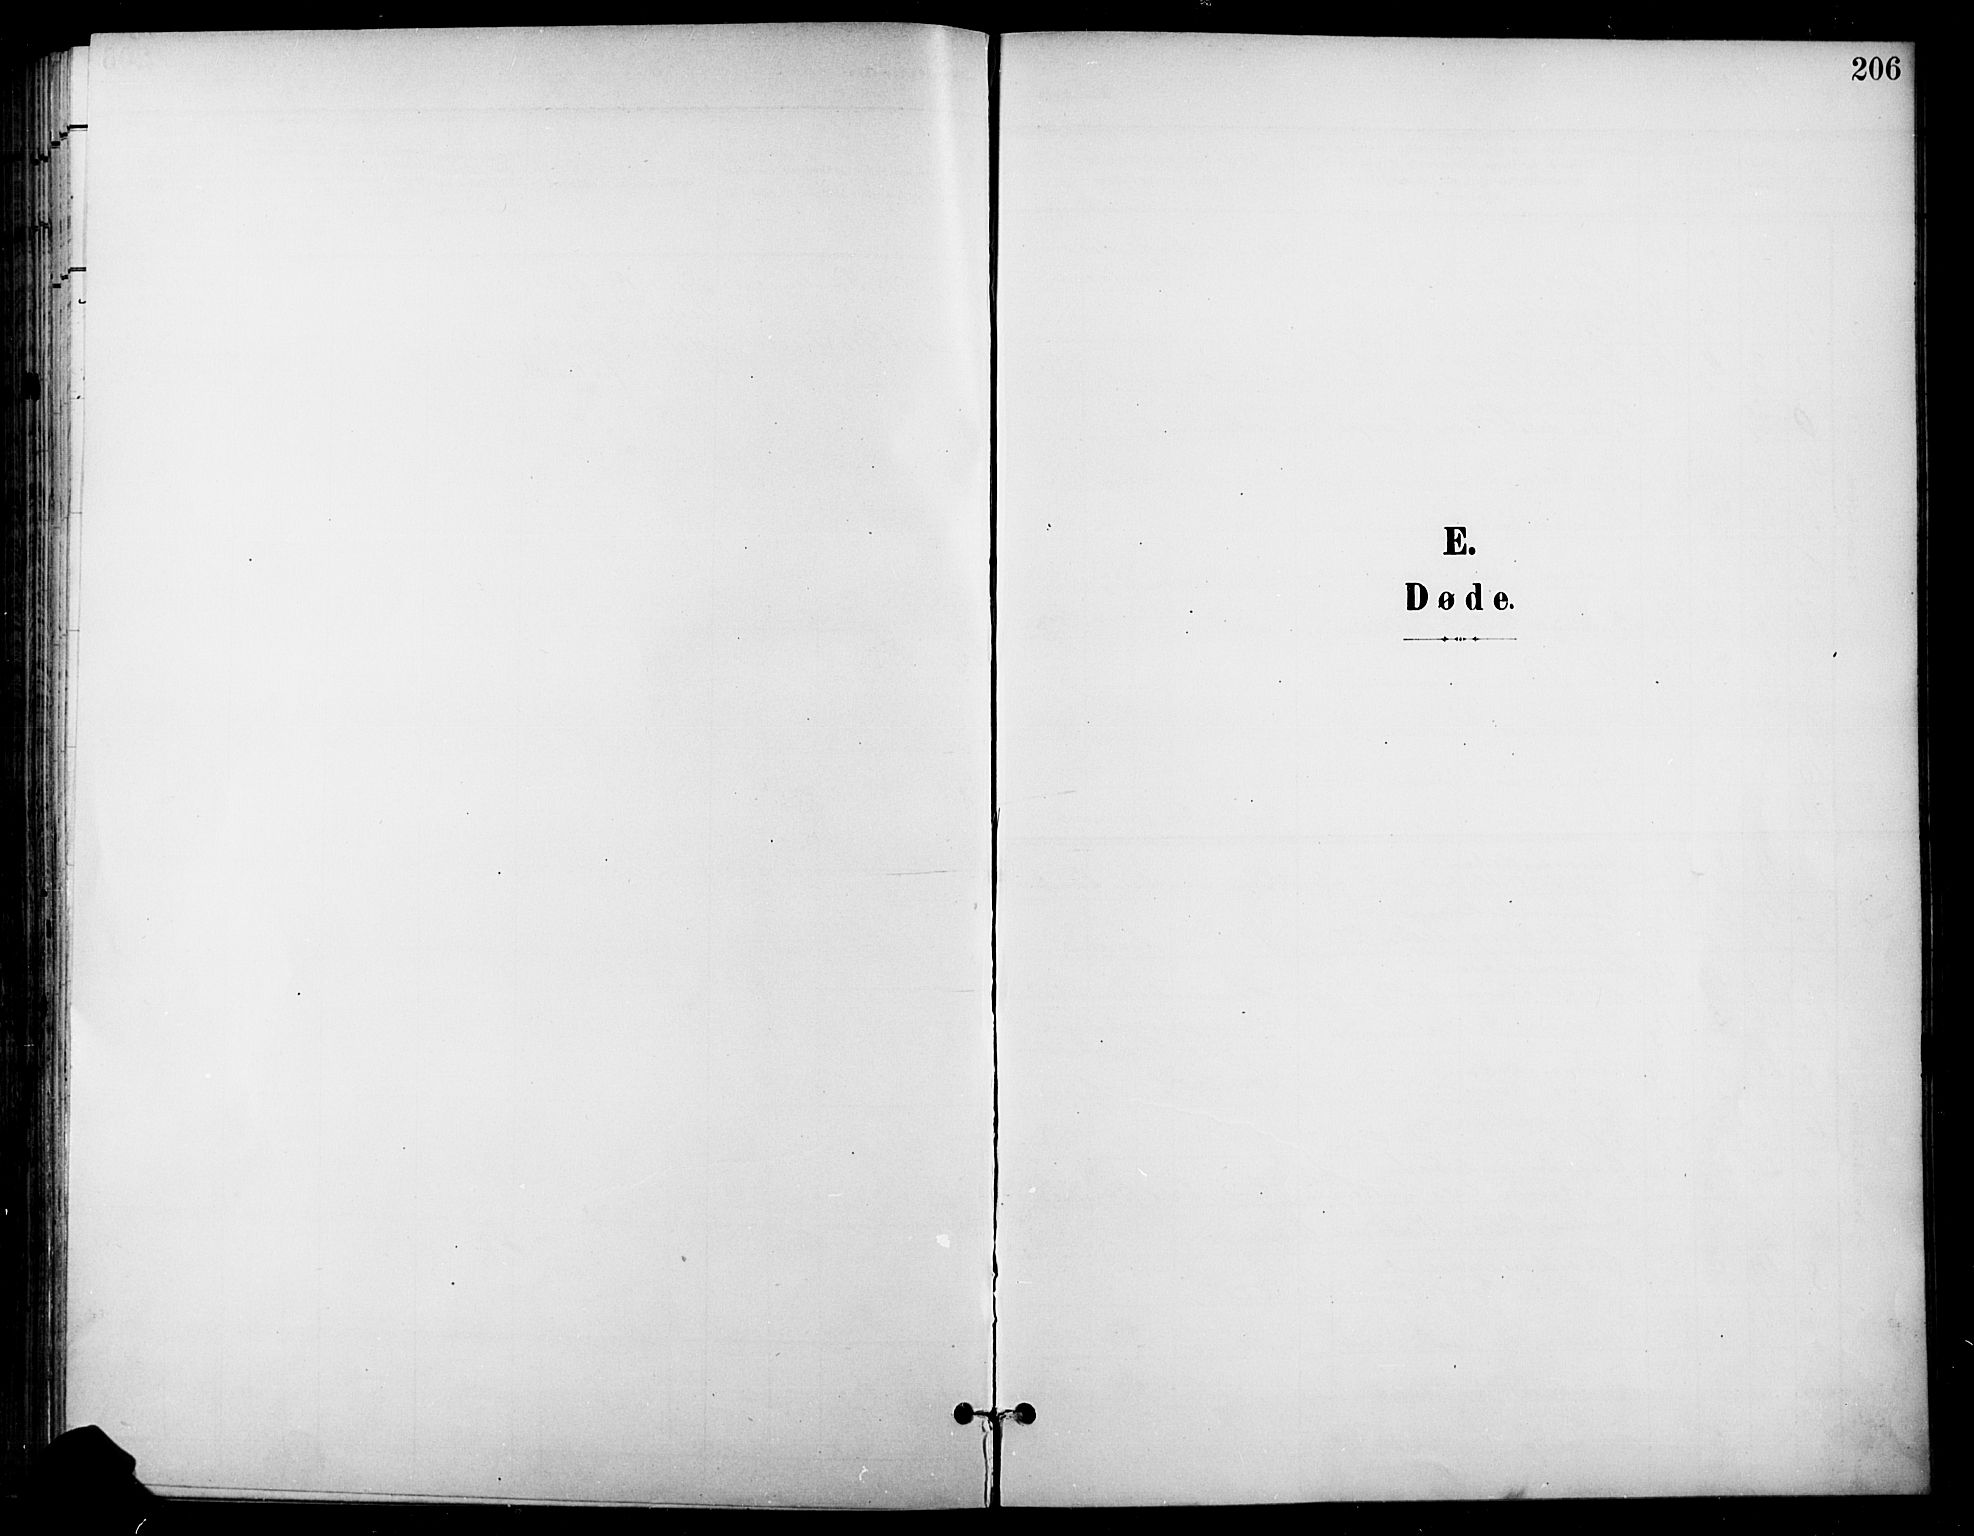 SAH, Gran prestekontor, Parish register (official) no. 19, 1898-1907, p. 206